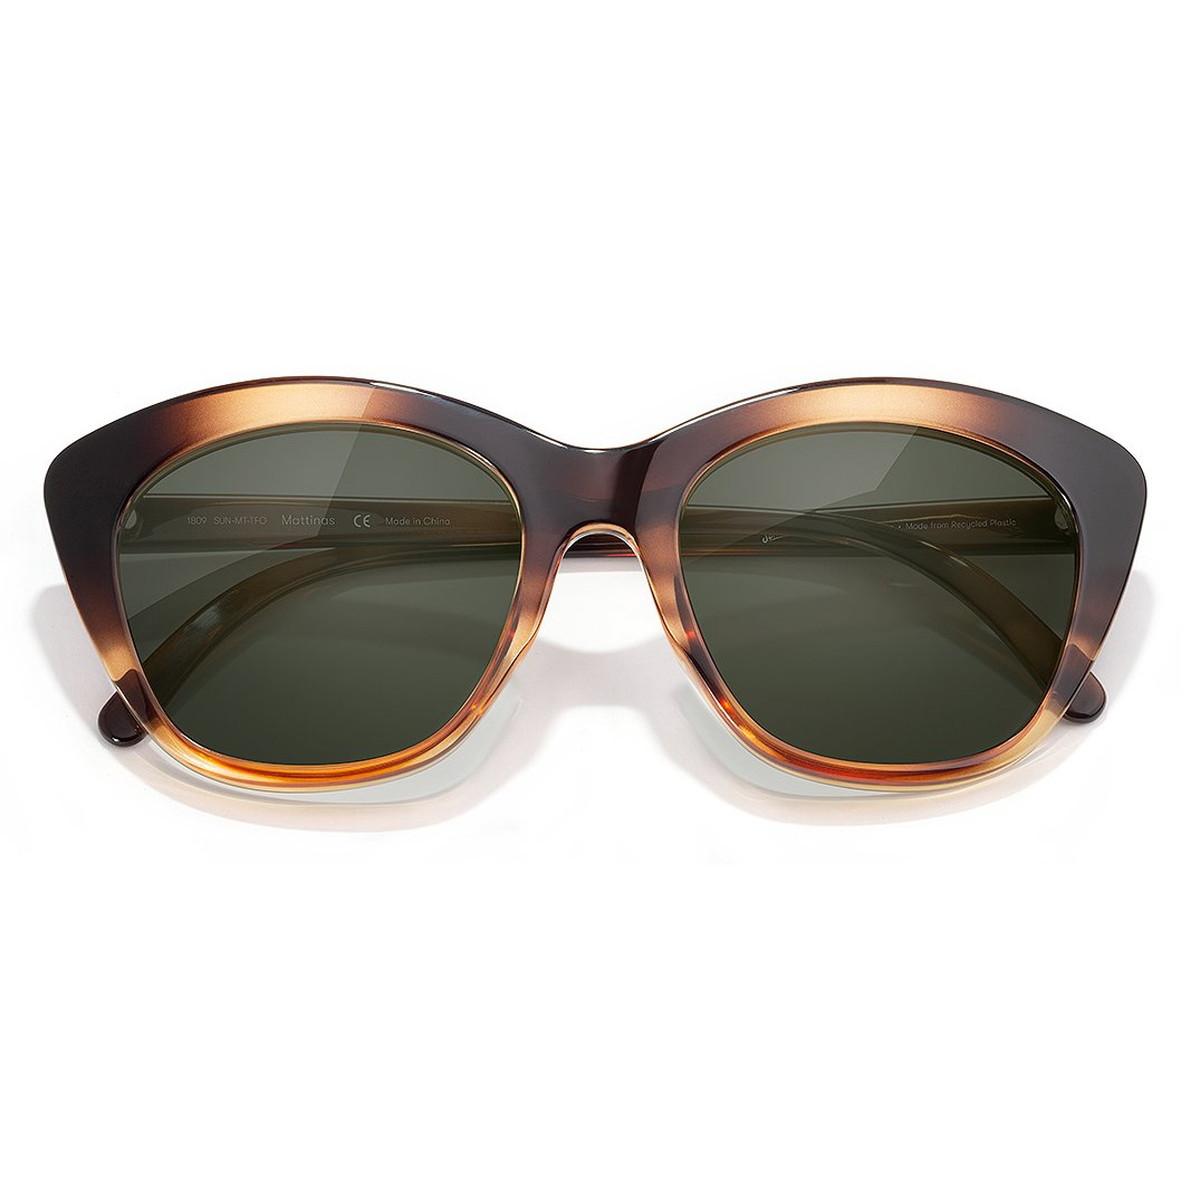 SUNSKI サンスキー Mattina Tortoise Forest 眼鏡 サングラス